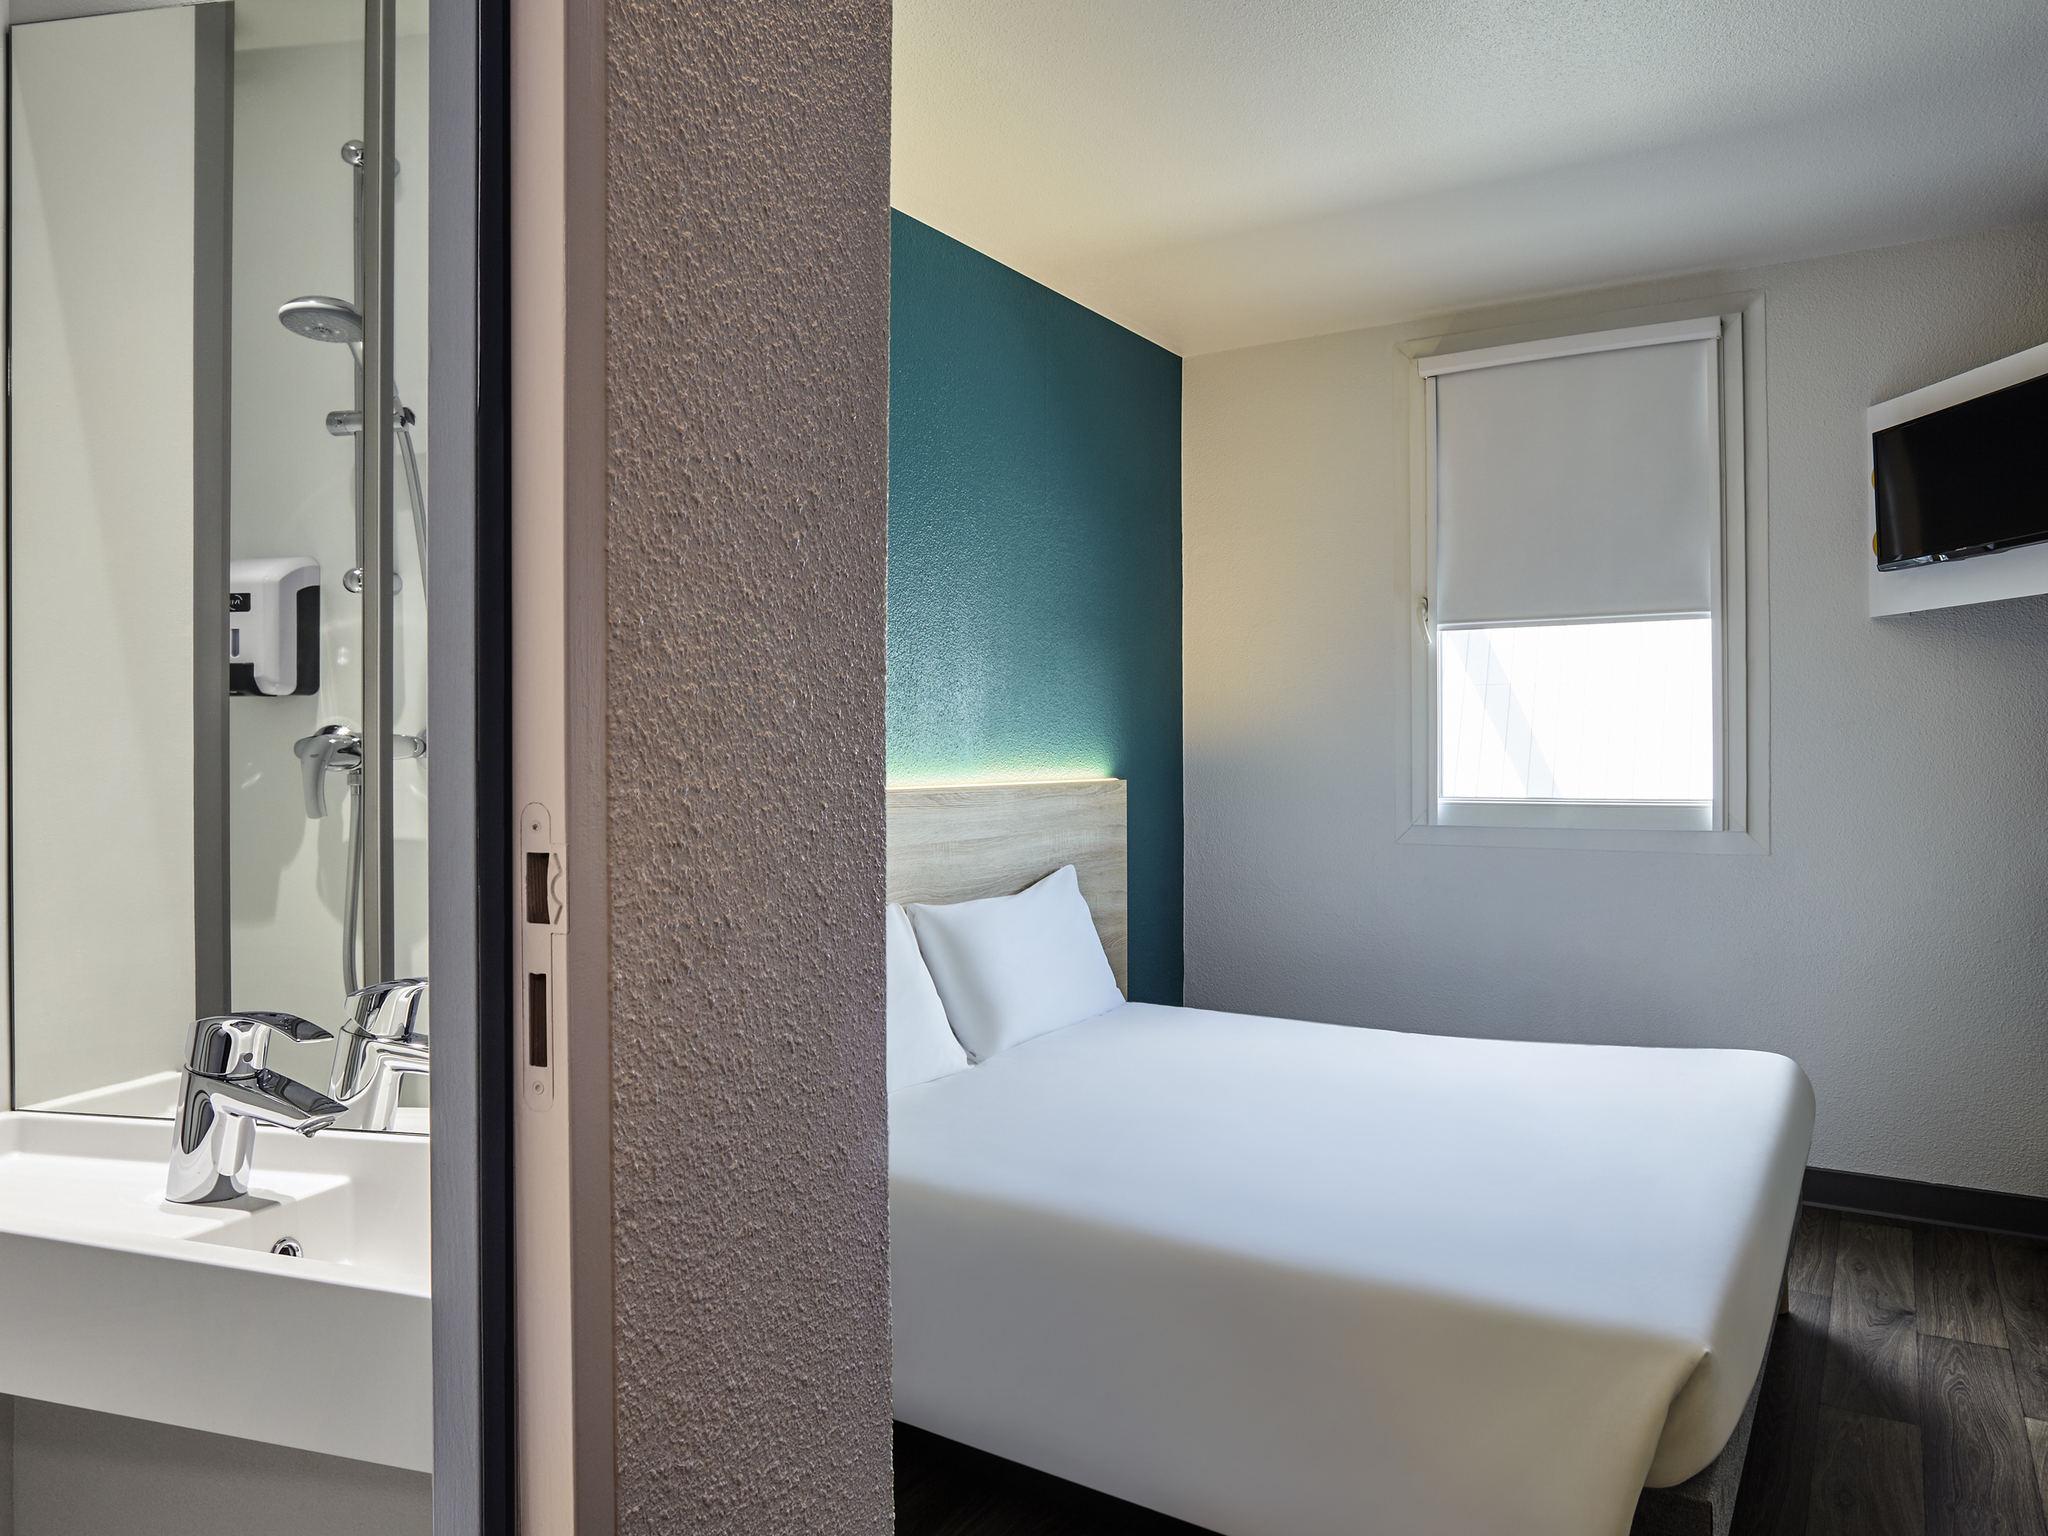 Hotel – hotelF1 Strasbourg Pont de l'Europe